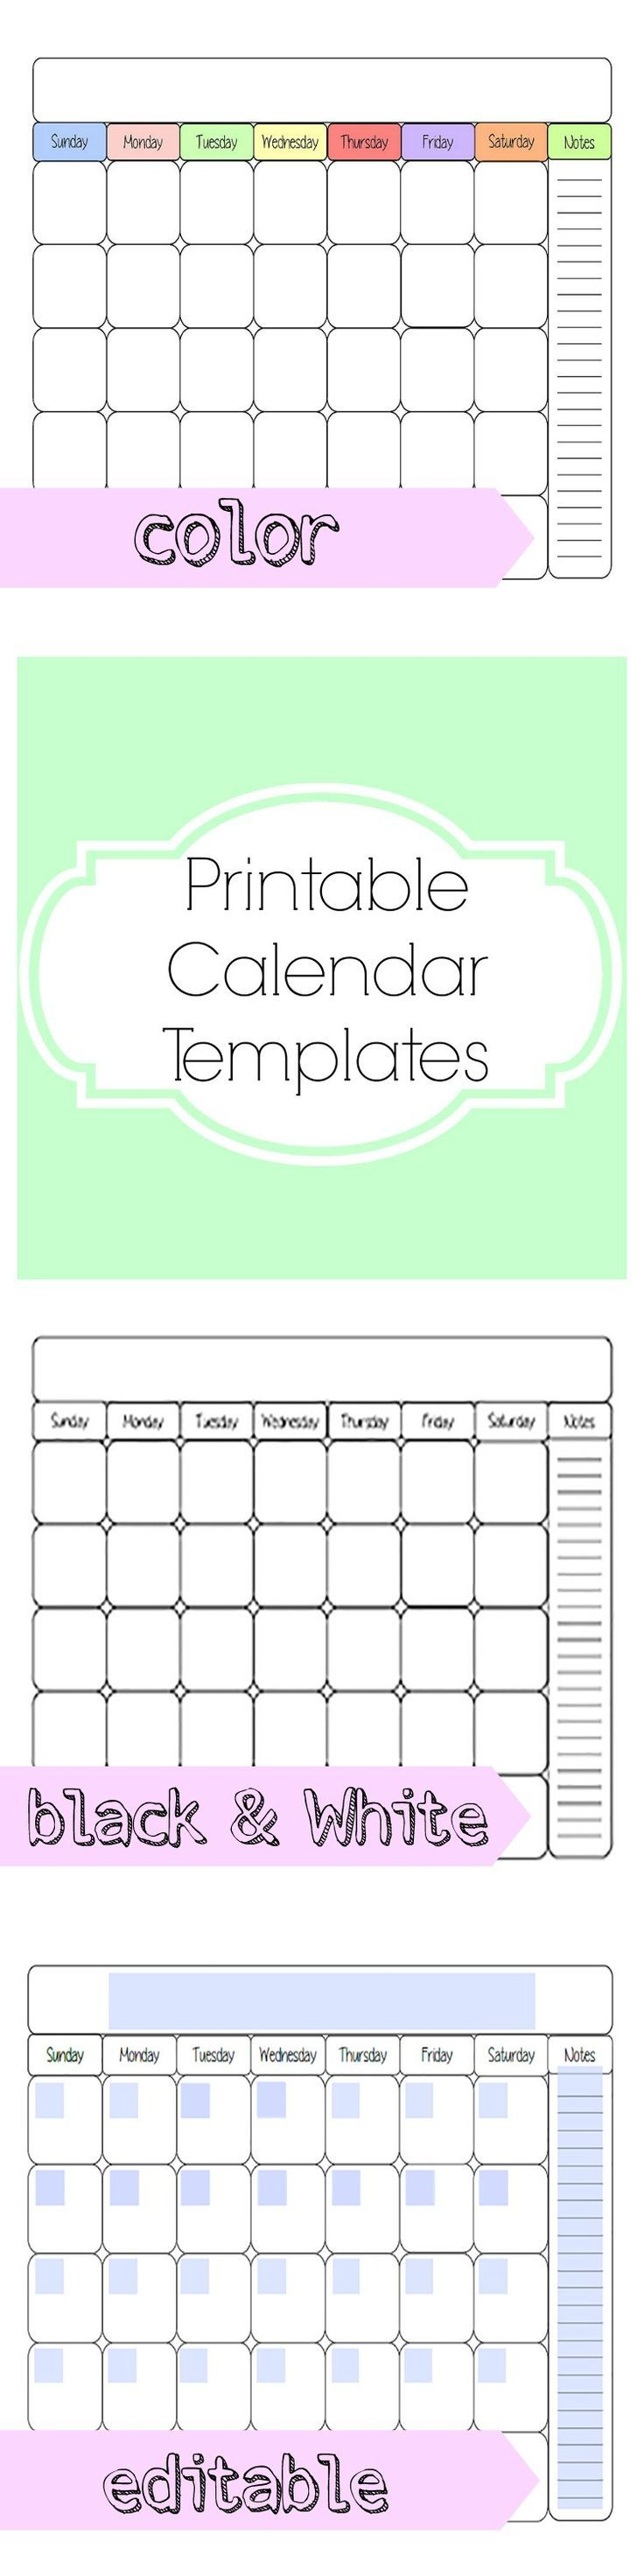 Calendar Diy Template : Best printable calendar template ideas on pinterest